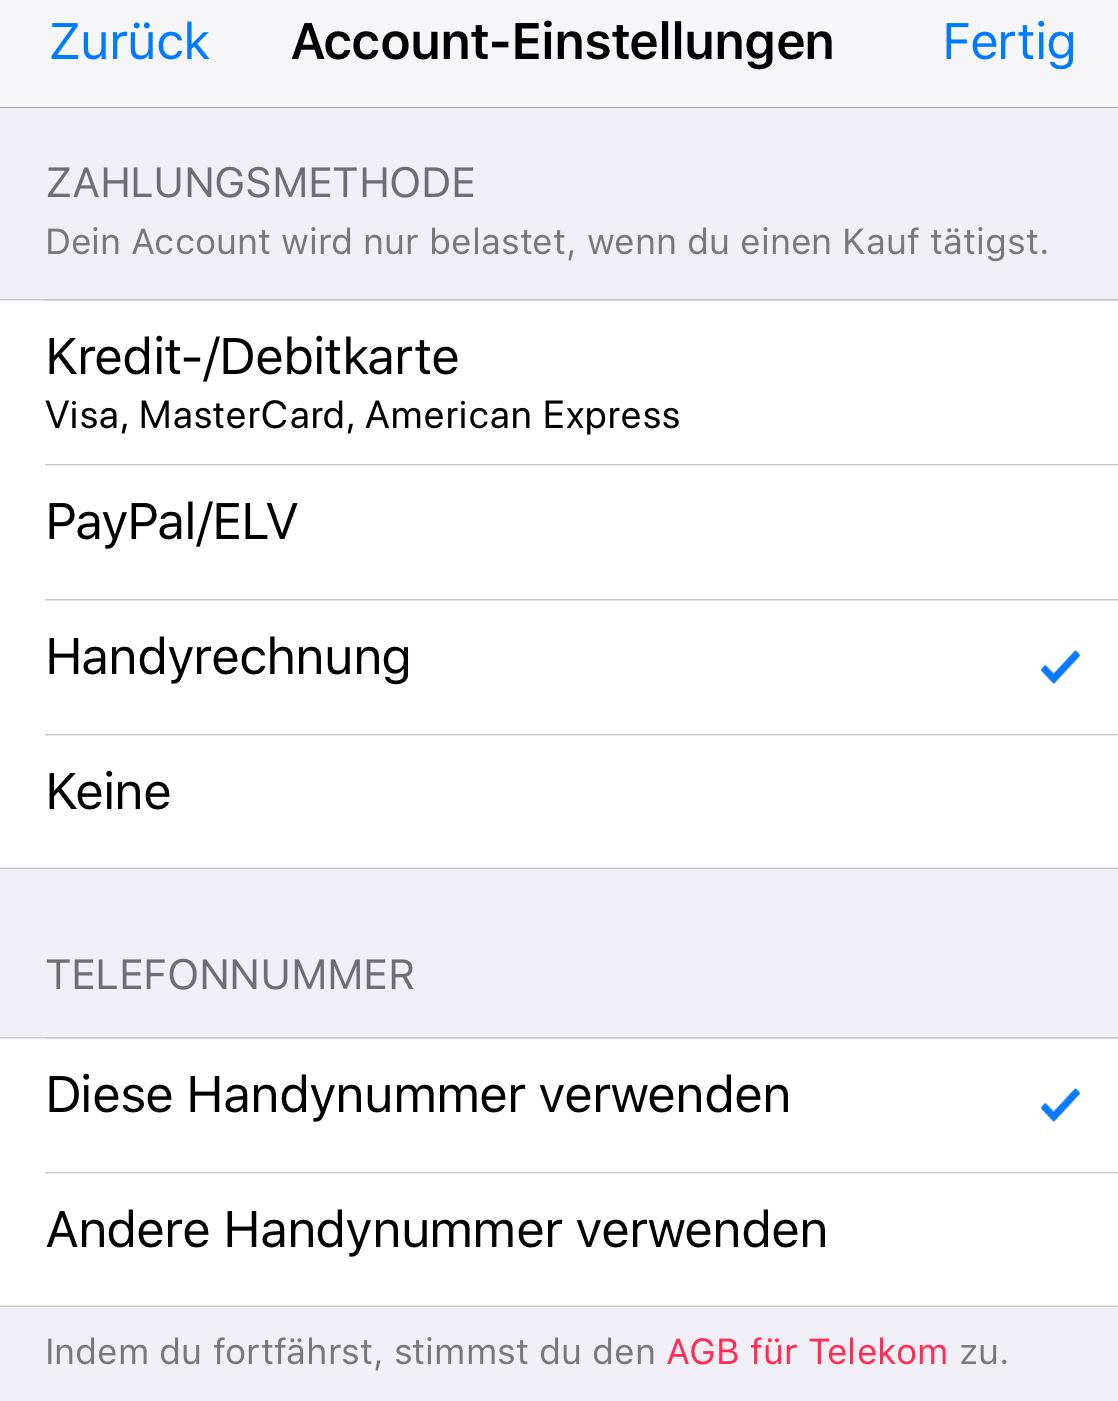 telekom bezahlung im apple app store jetzt auch via handy. Black Bedroom Furniture Sets. Home Design Ideas